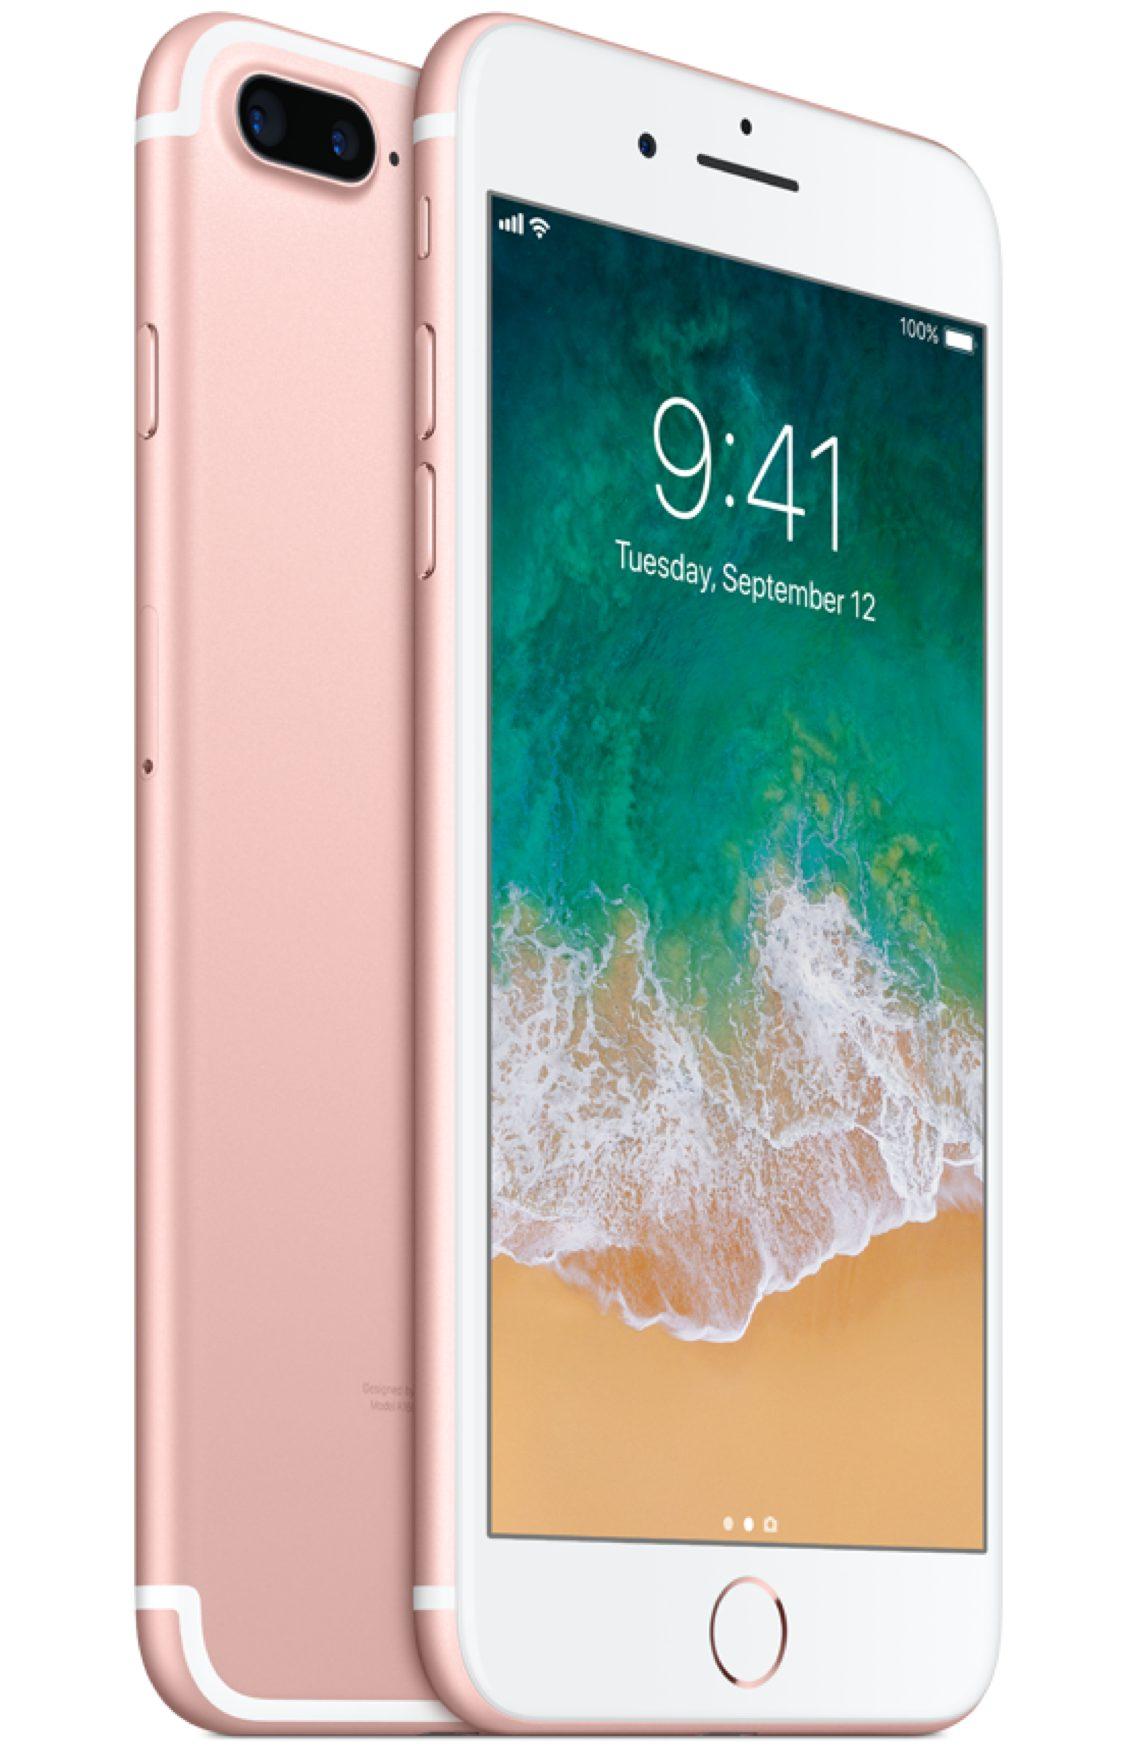 Apple Iphone 7 Plus 128gb Rose Gold Verizon T Mobile At T Unlocked Smartphone Ebay